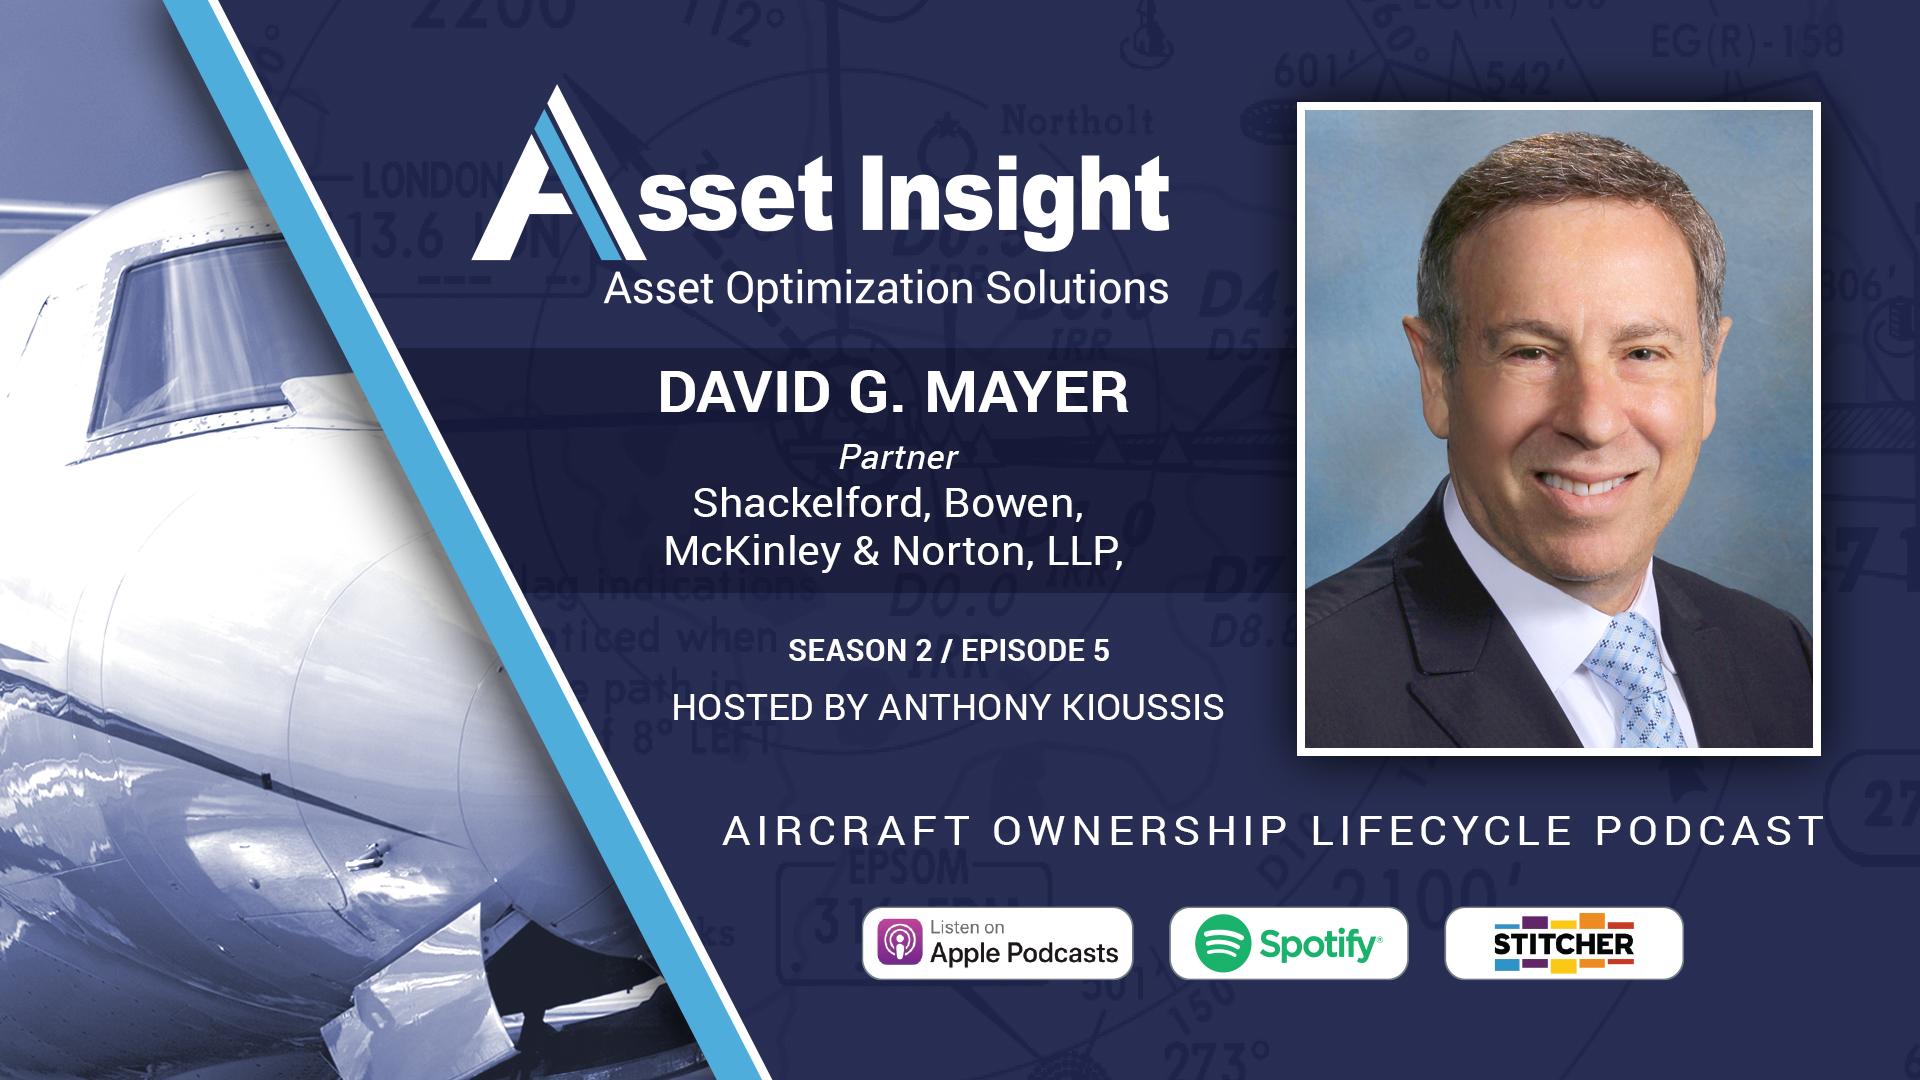 David G. Mayer, Partner, Shackelford, Bowen, McKinley & Norton, LLP